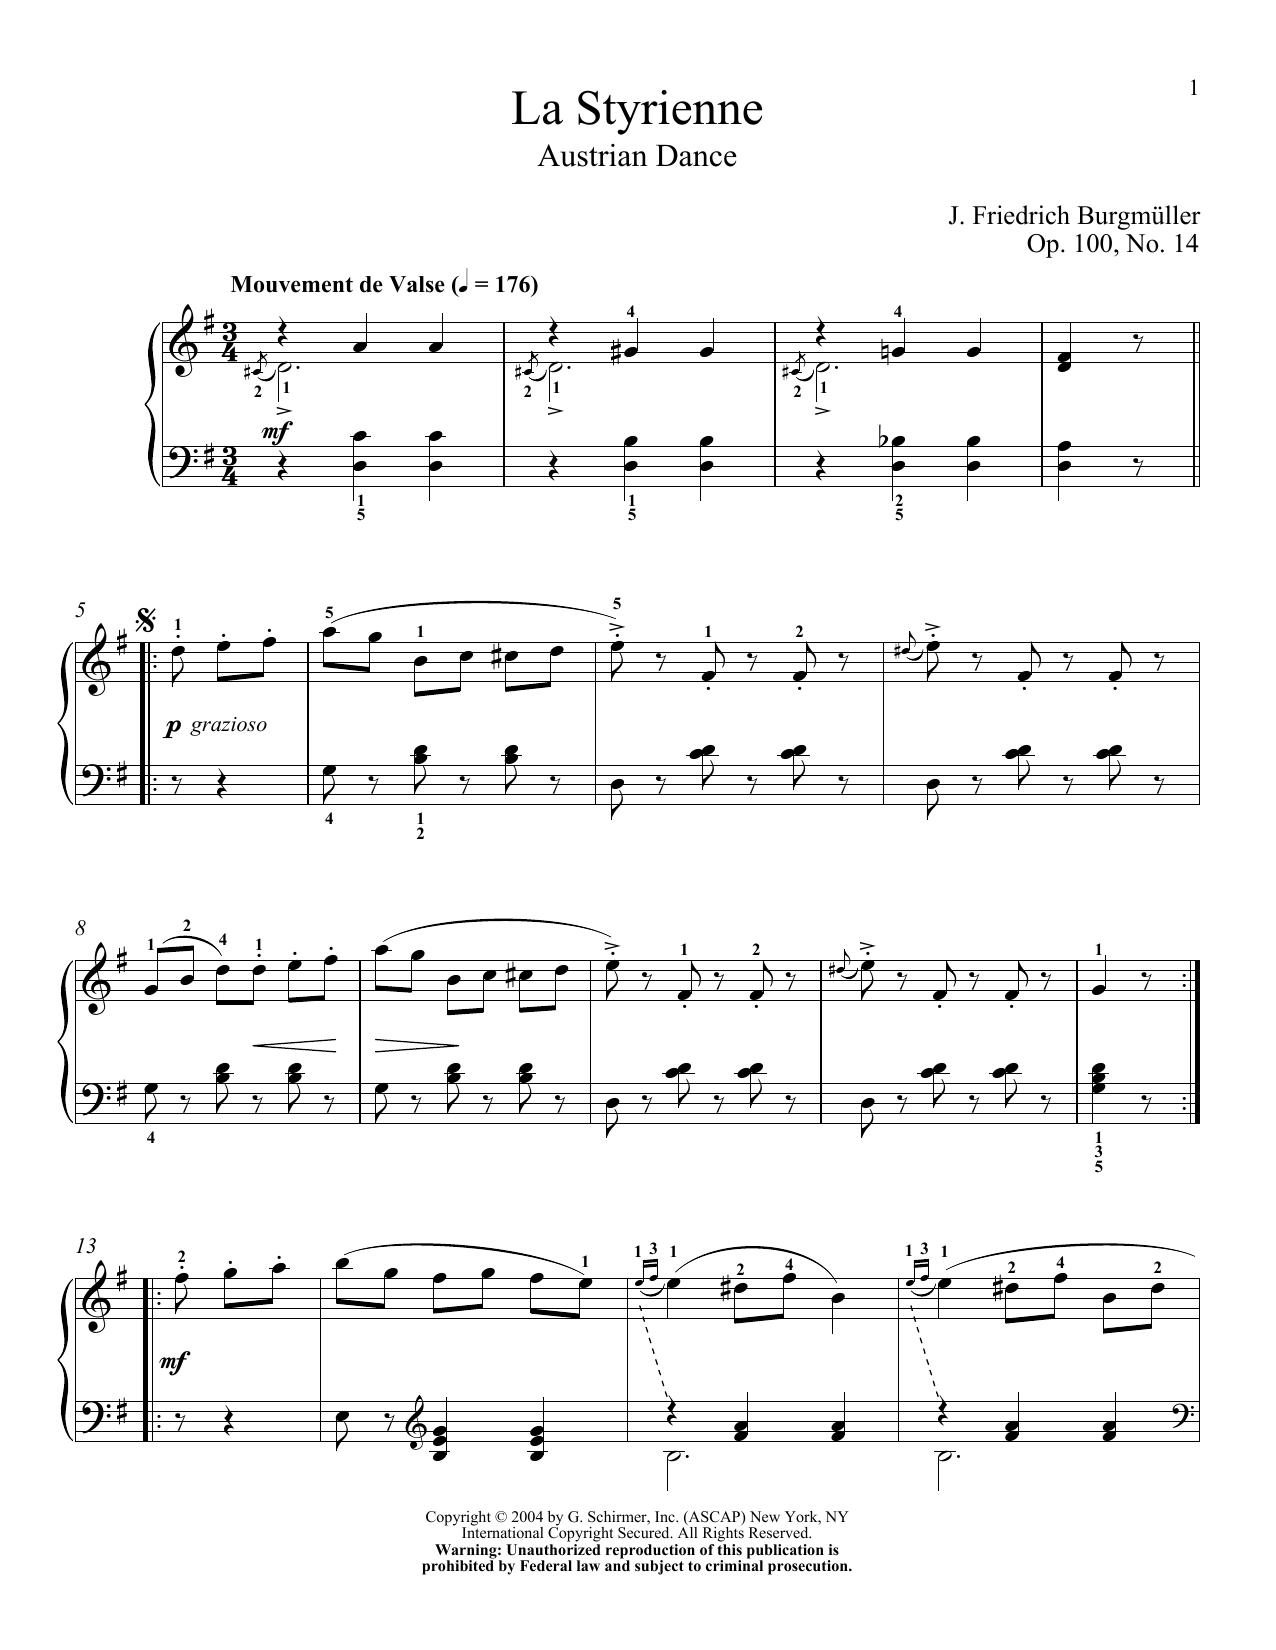 La Styrienne, Op. 100, No. 14 (Piano Solo)